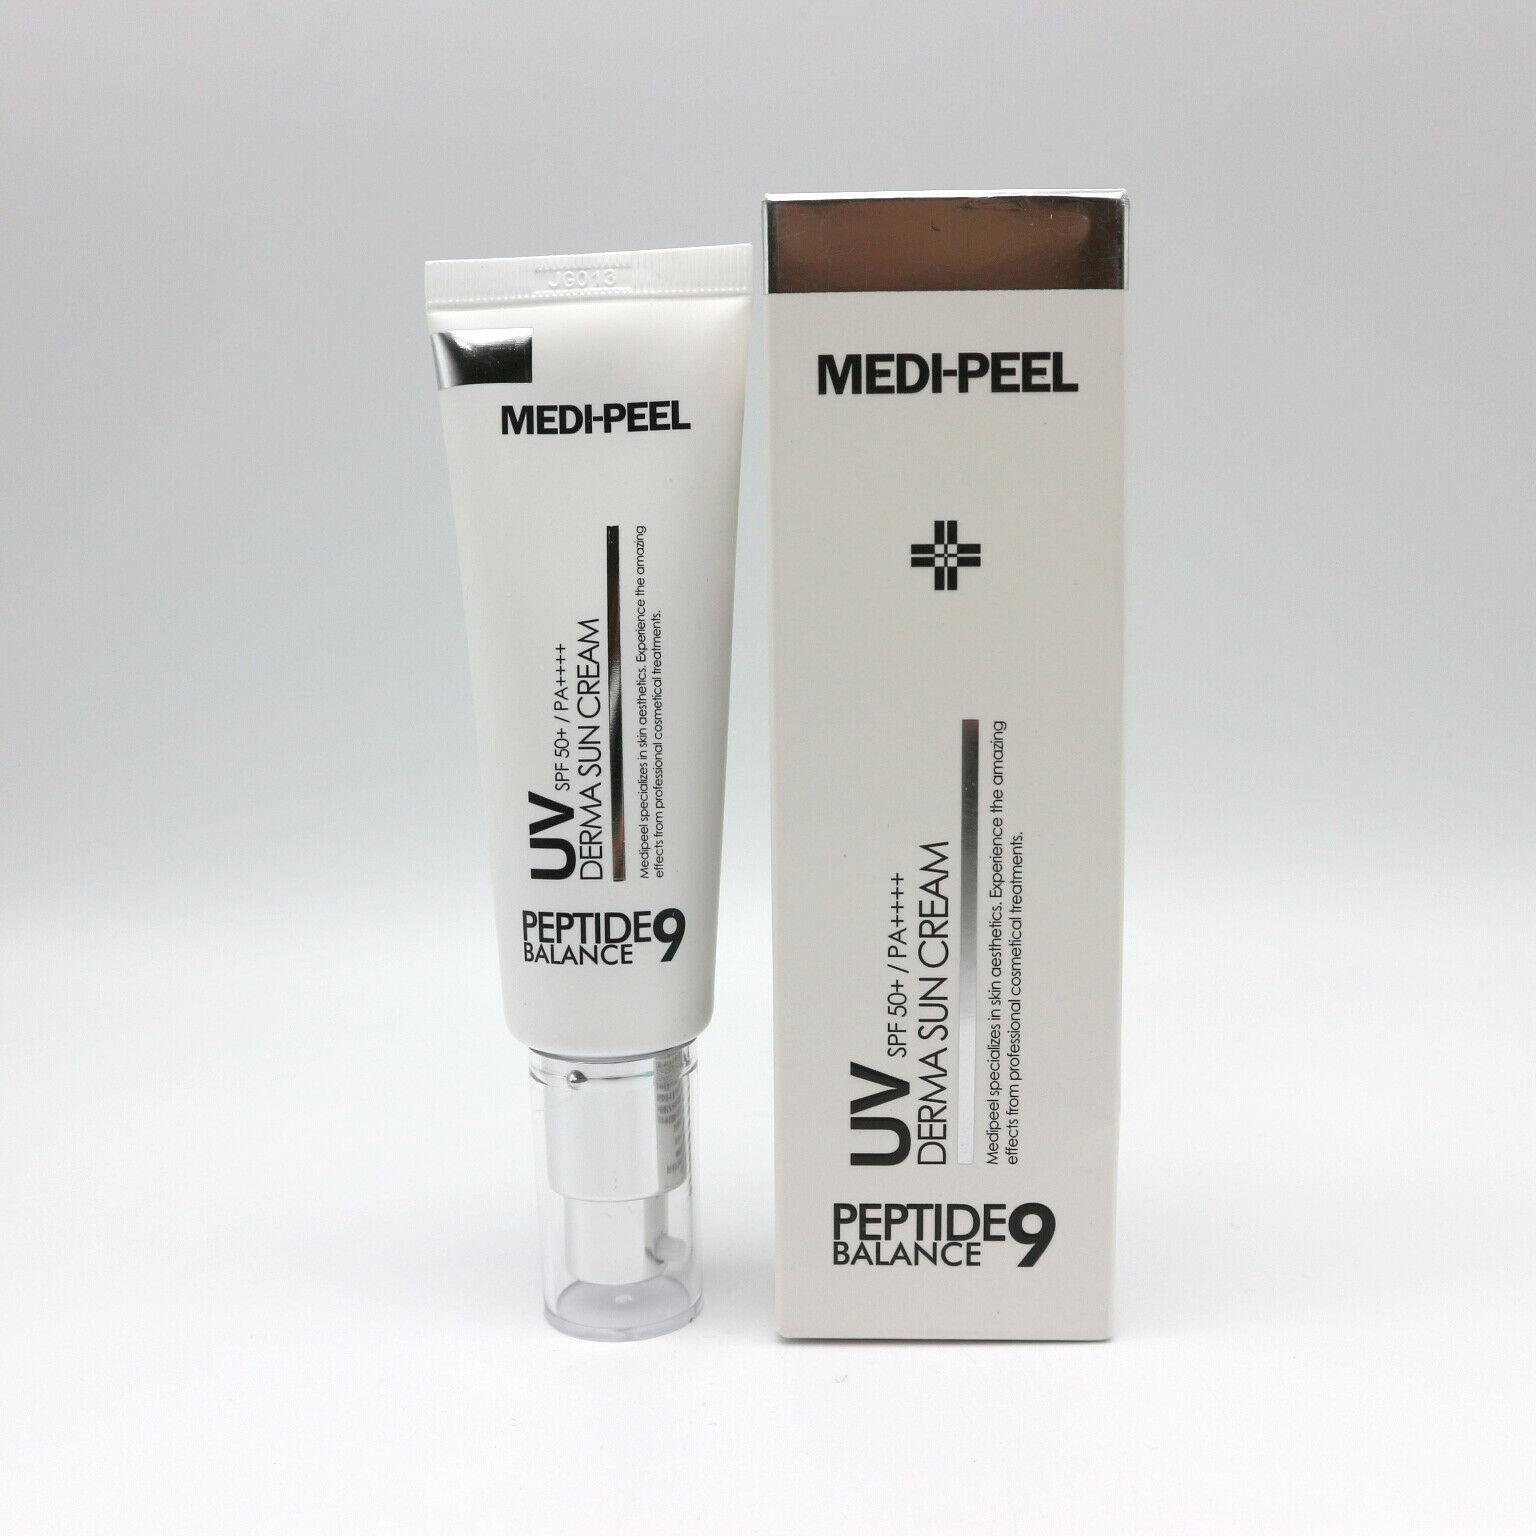 MEDI-PEEL Derma Sun Cream Солнцезащитный крем UV SPF50+ 50мл